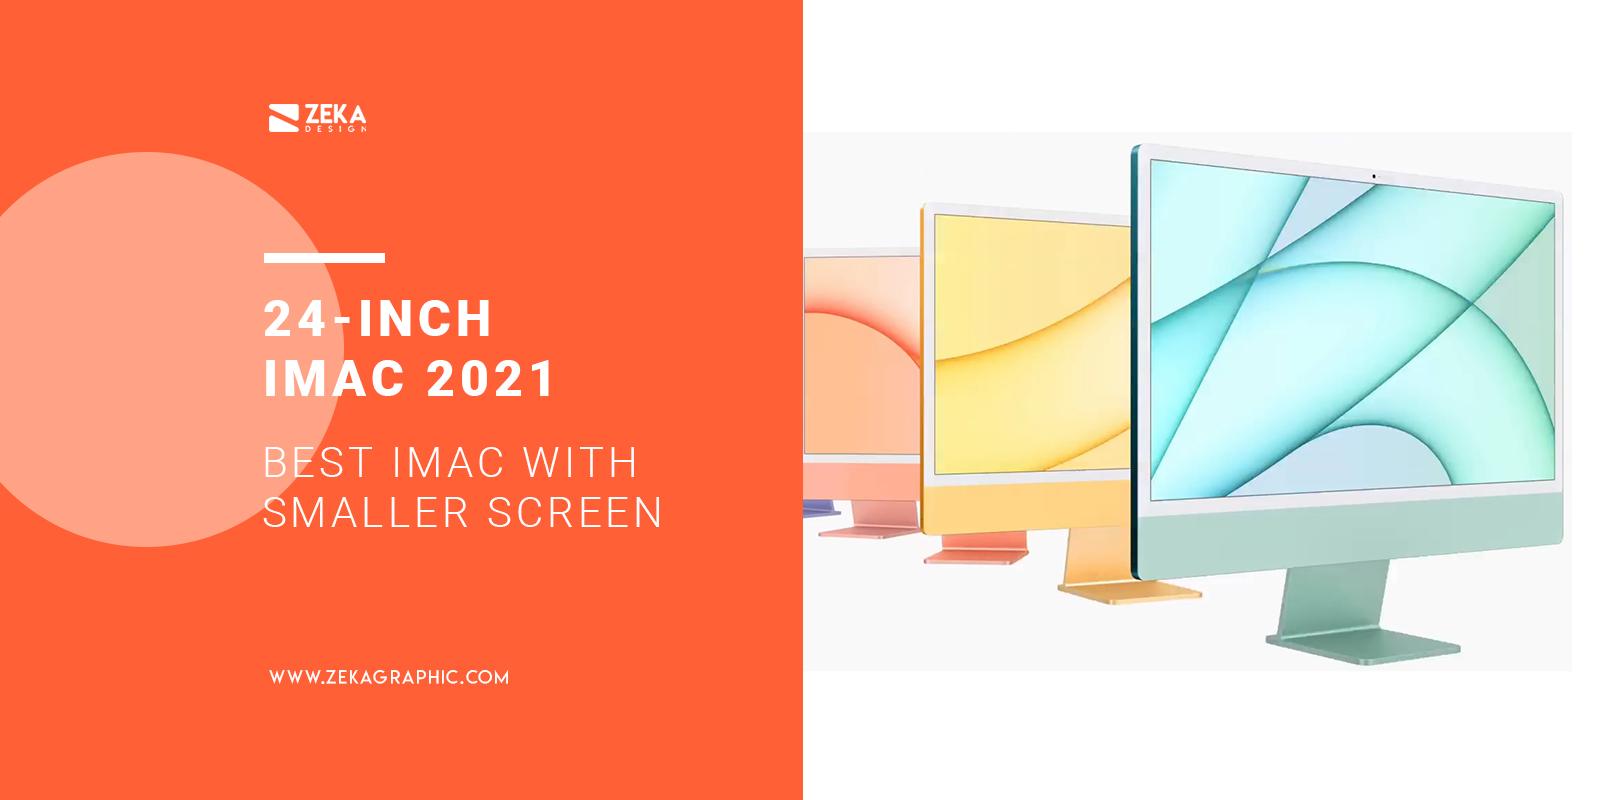 24 inch iMac 2021 Best Apple Mac For Graphic Design